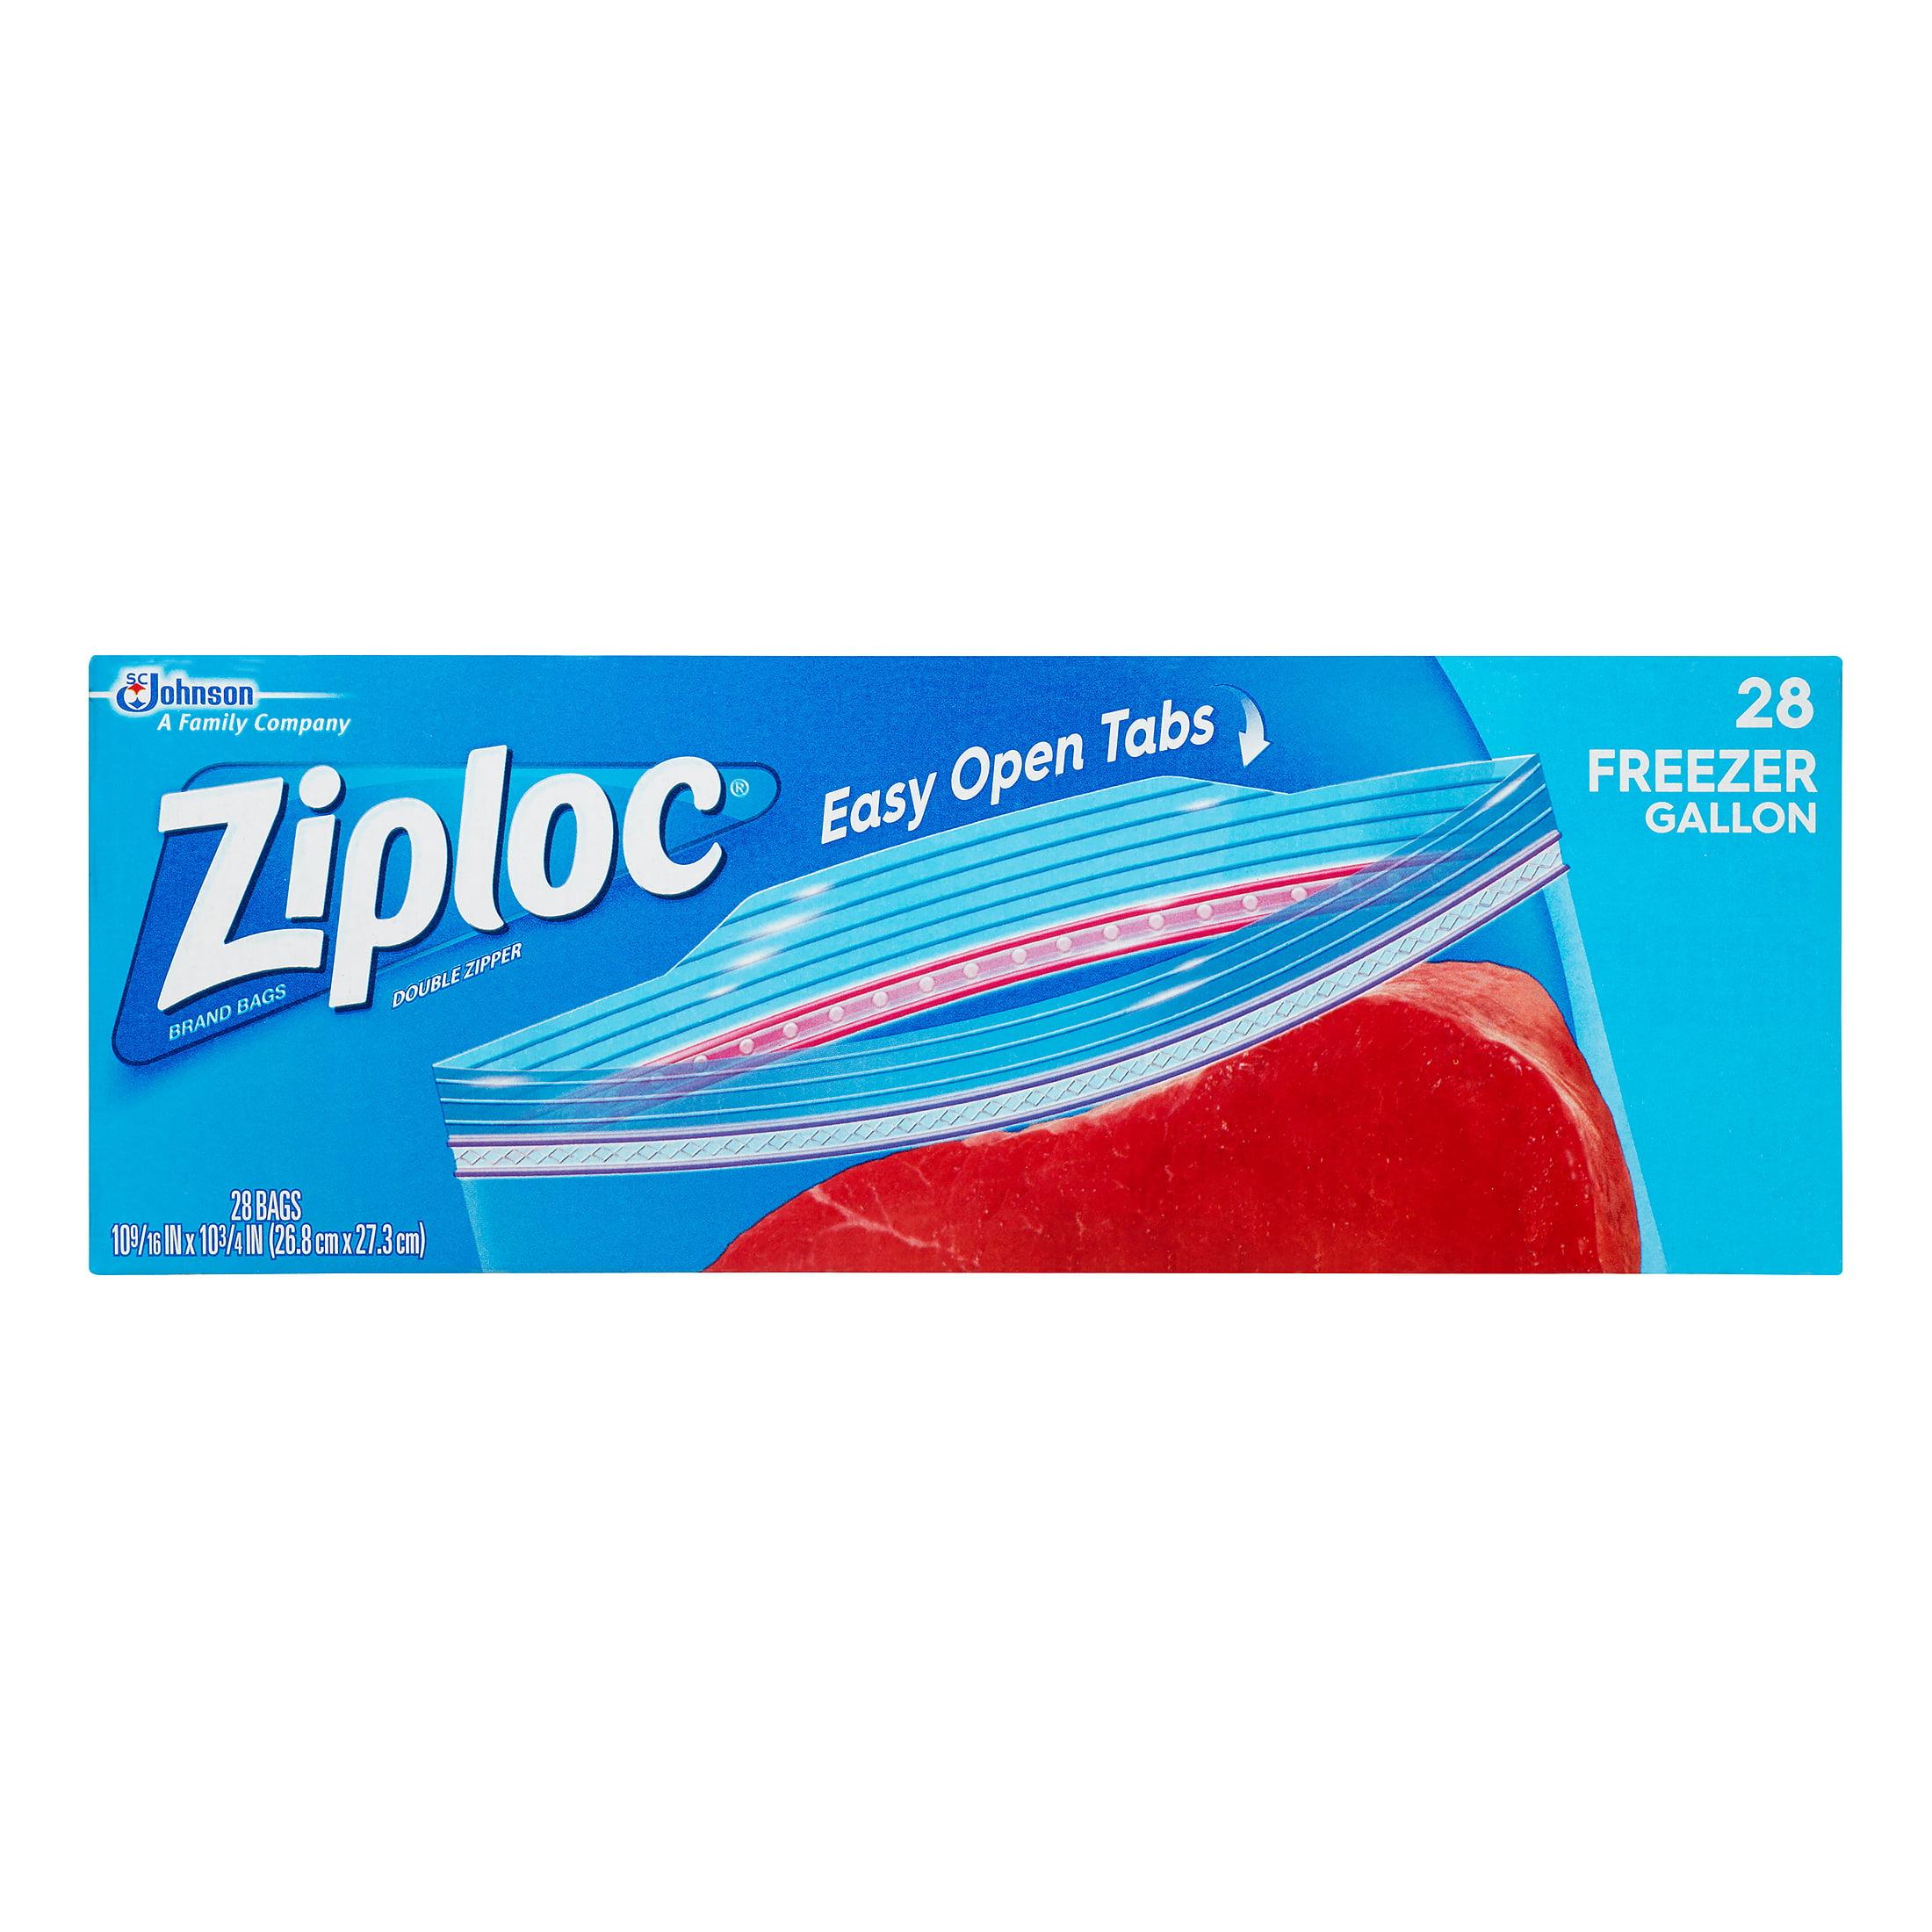 Ziploc Double Zipper Storage Bags, Gallon, 28 Ct